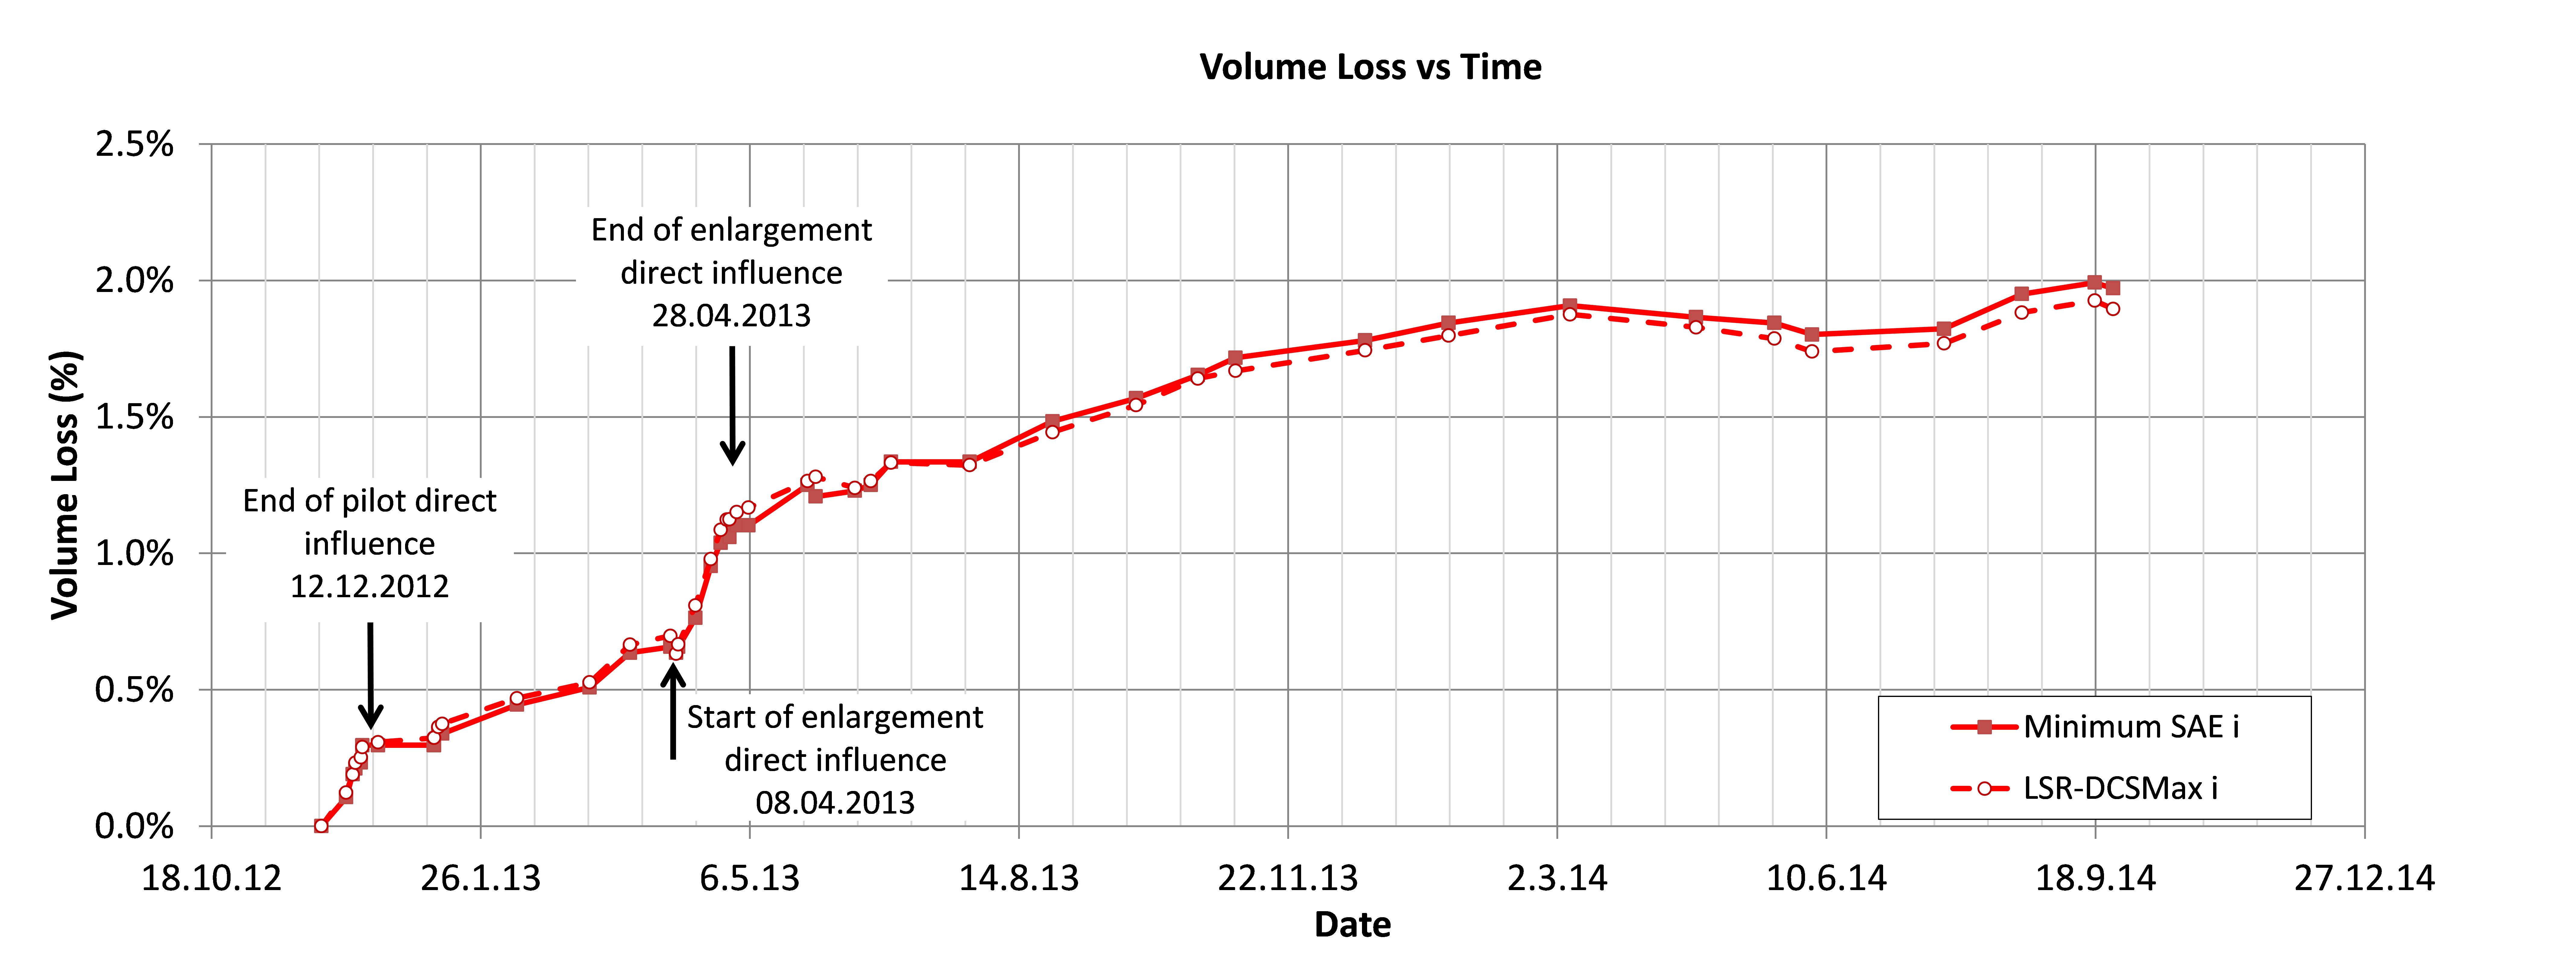 Figure 32. Volume loss development, analysis from single Gaussian curve analysis.